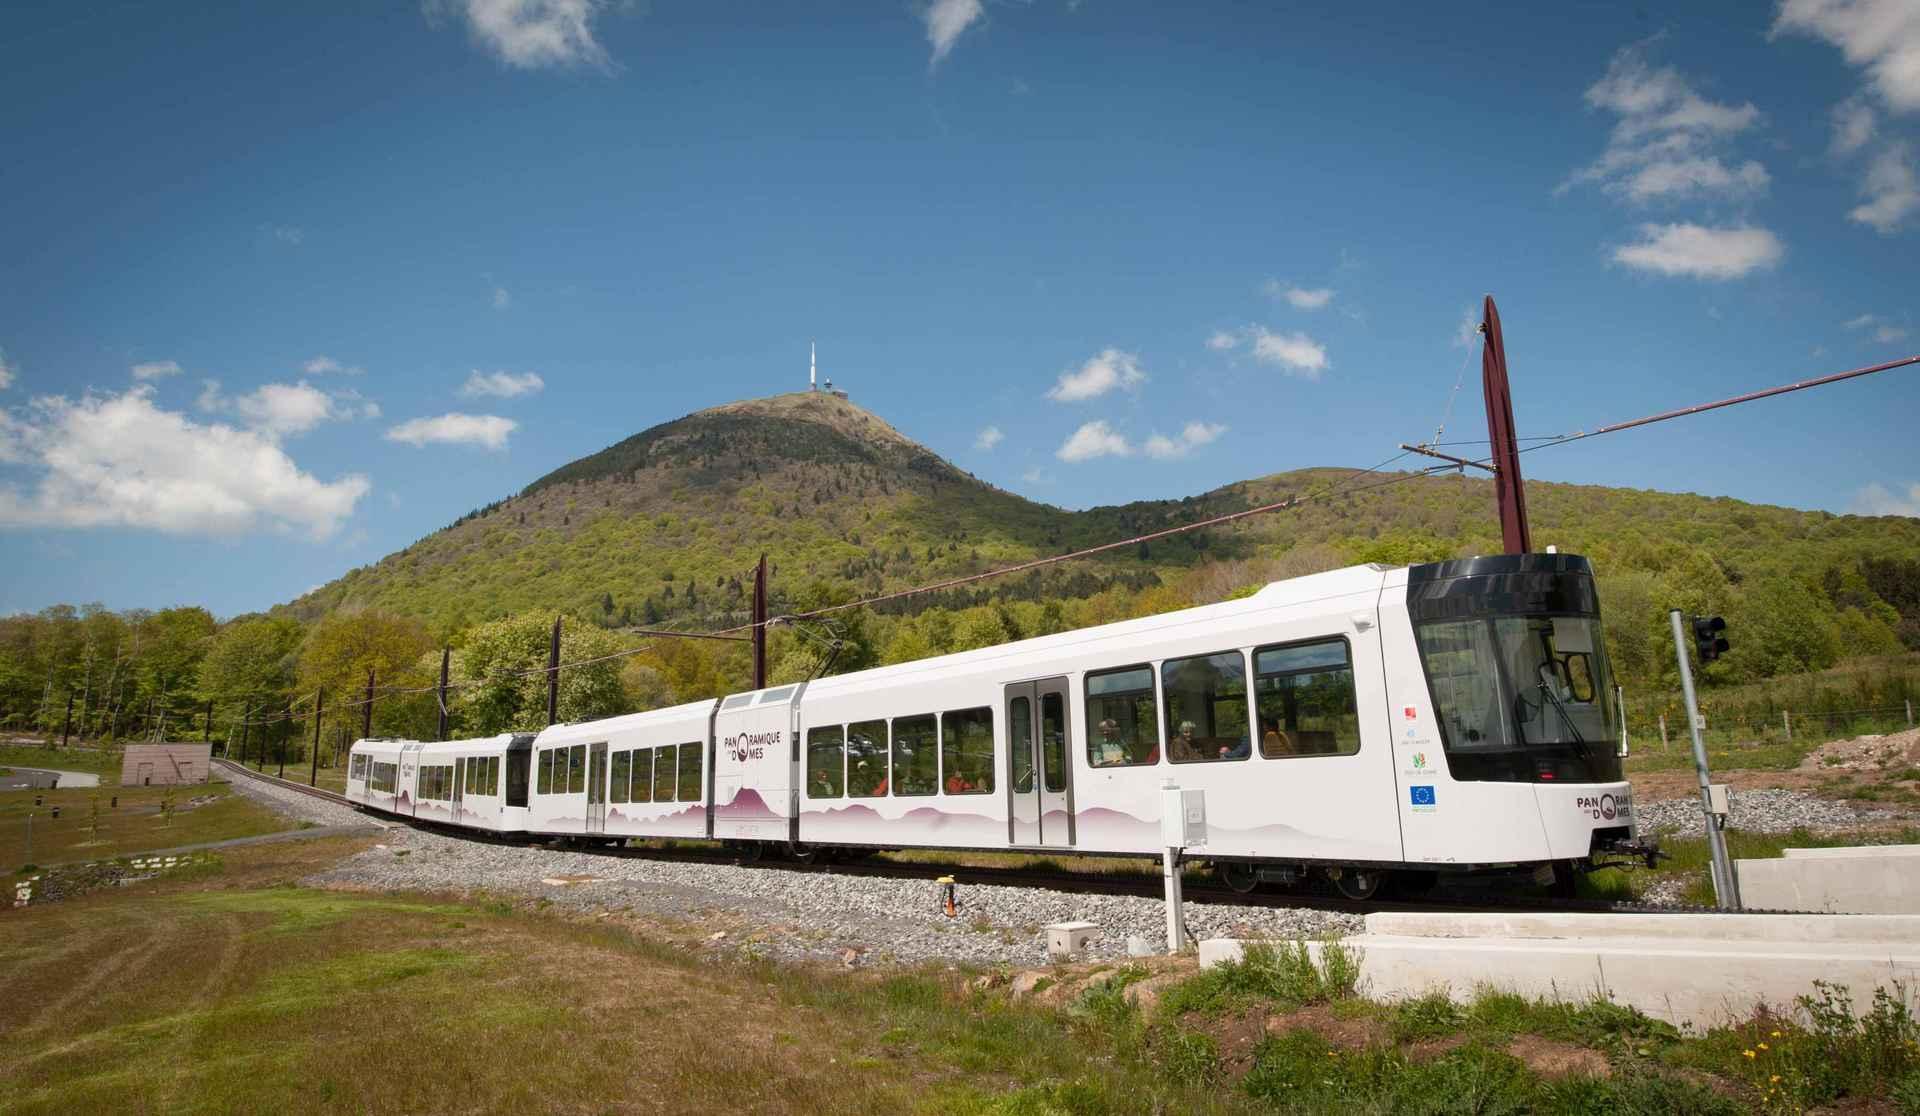 「chaine des puys Train」の画像検索結果